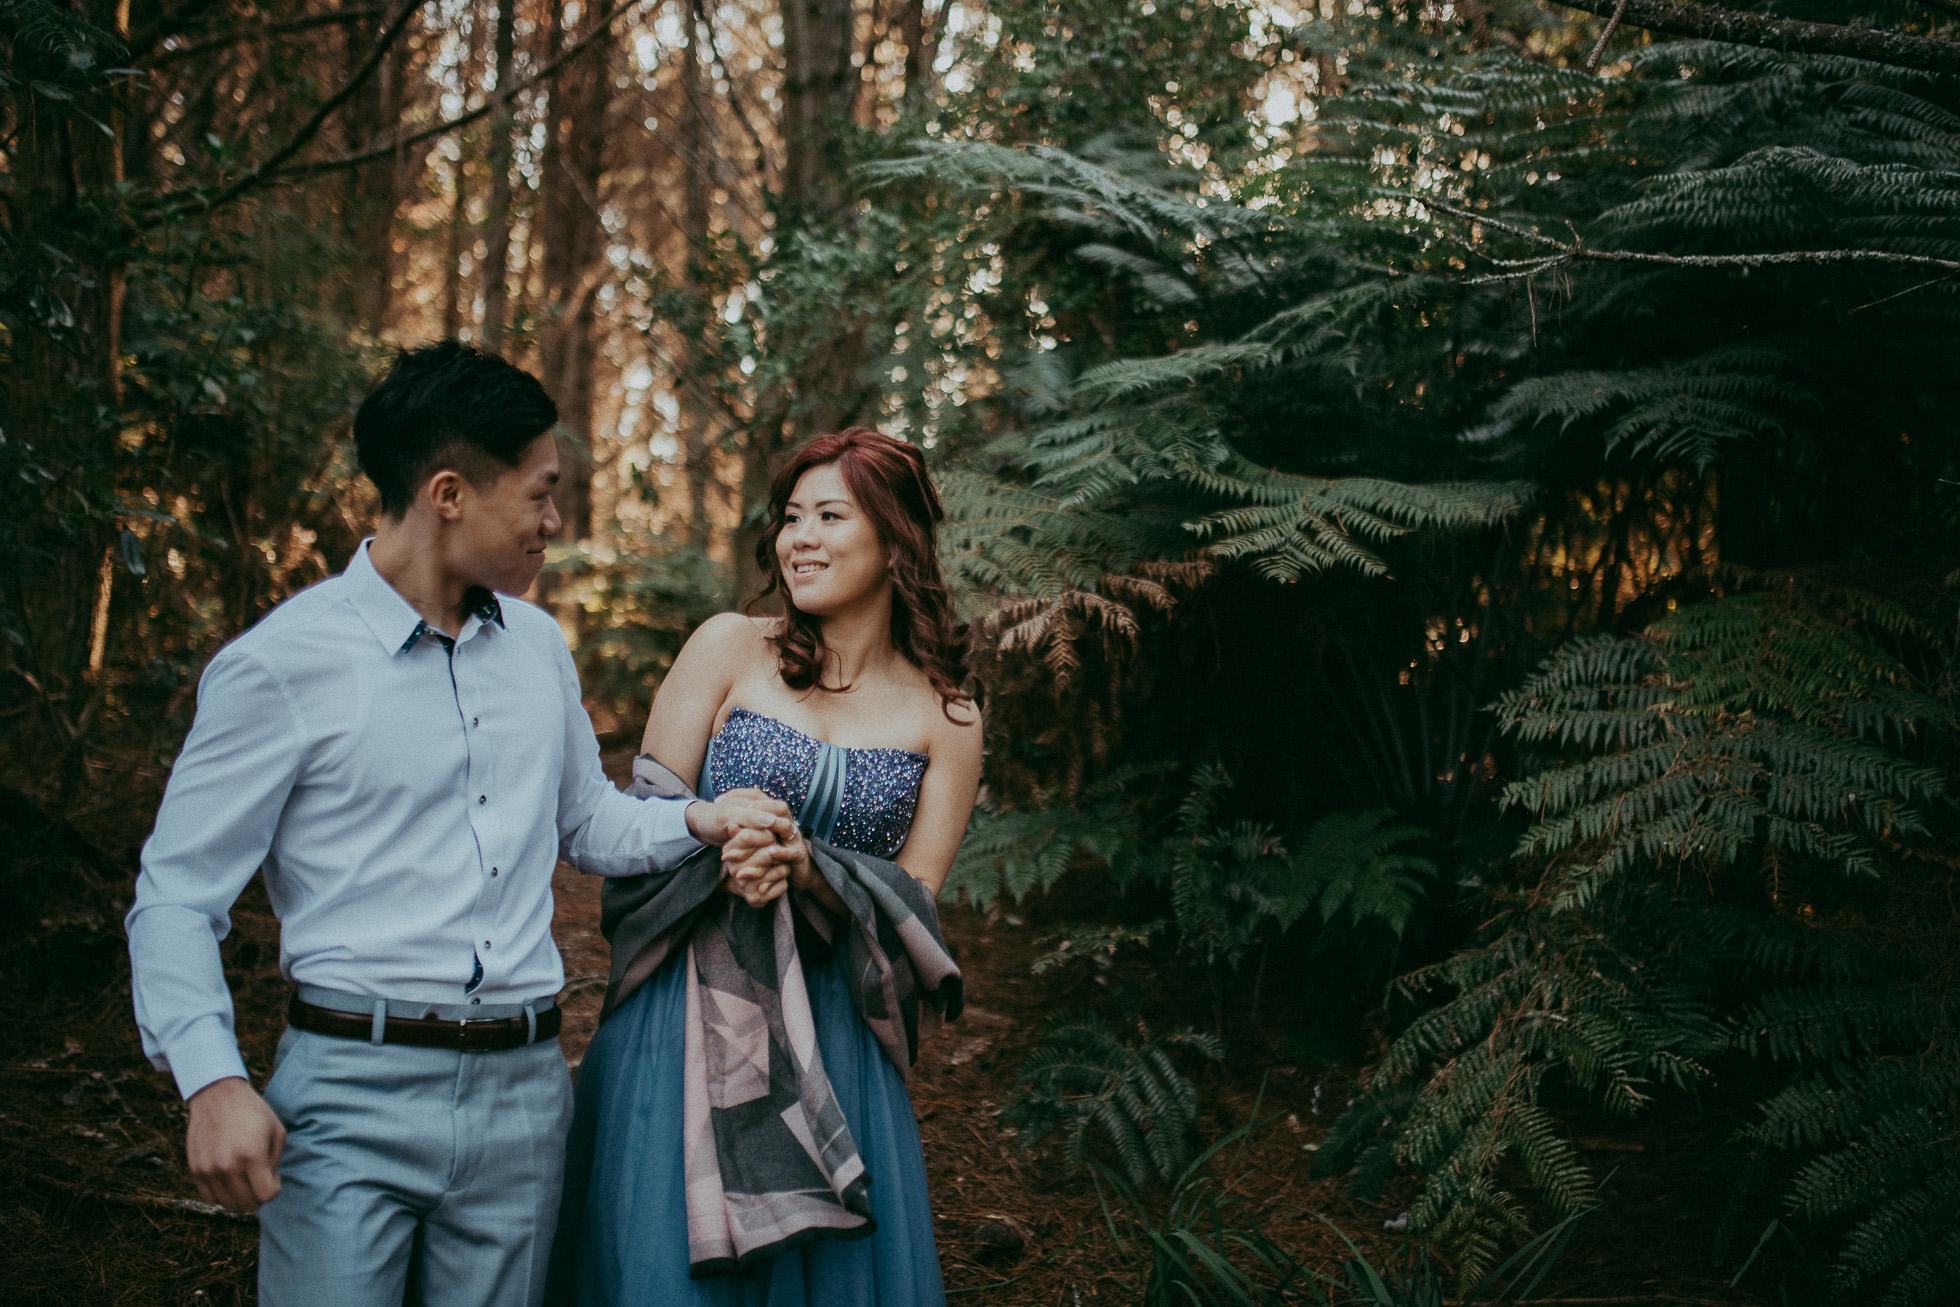 Pre-wedding photo shoot in New Zealand {Auckland wedding photographer} Riverhead forest